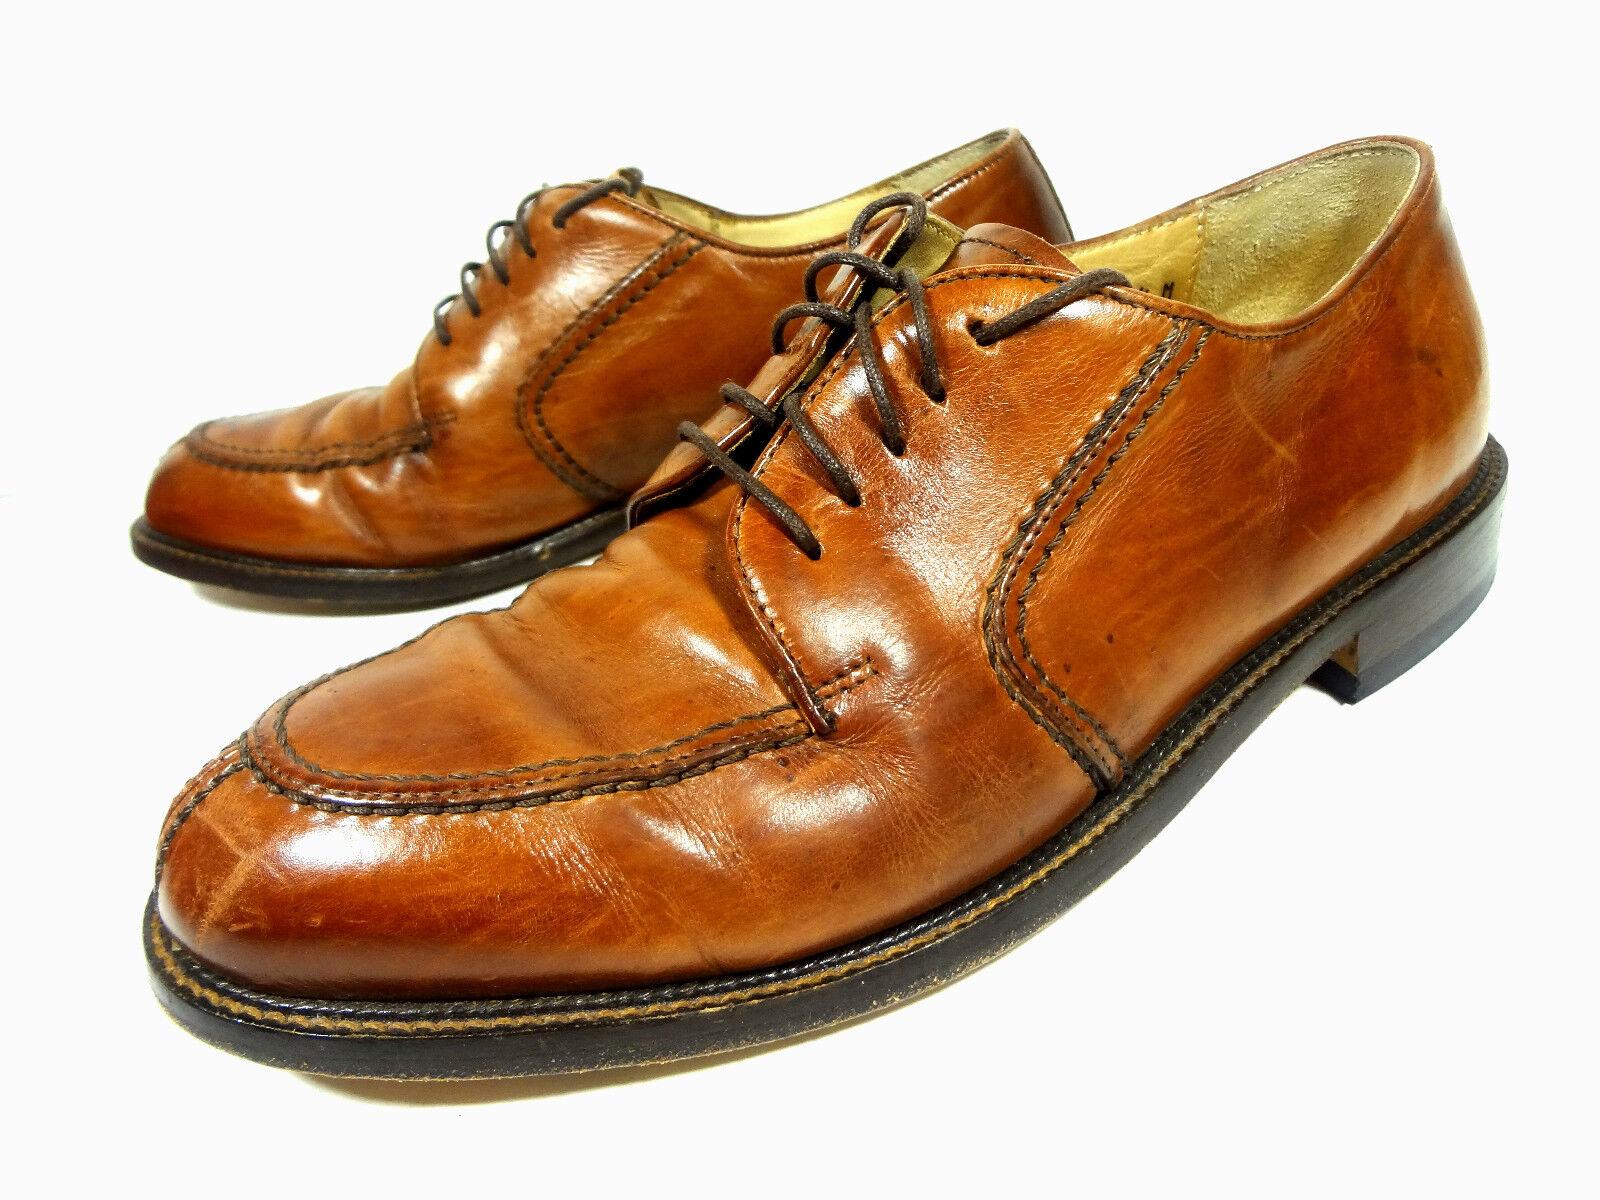 Pronto men Mens Oxfords Brown Leather shoes 7.5 M